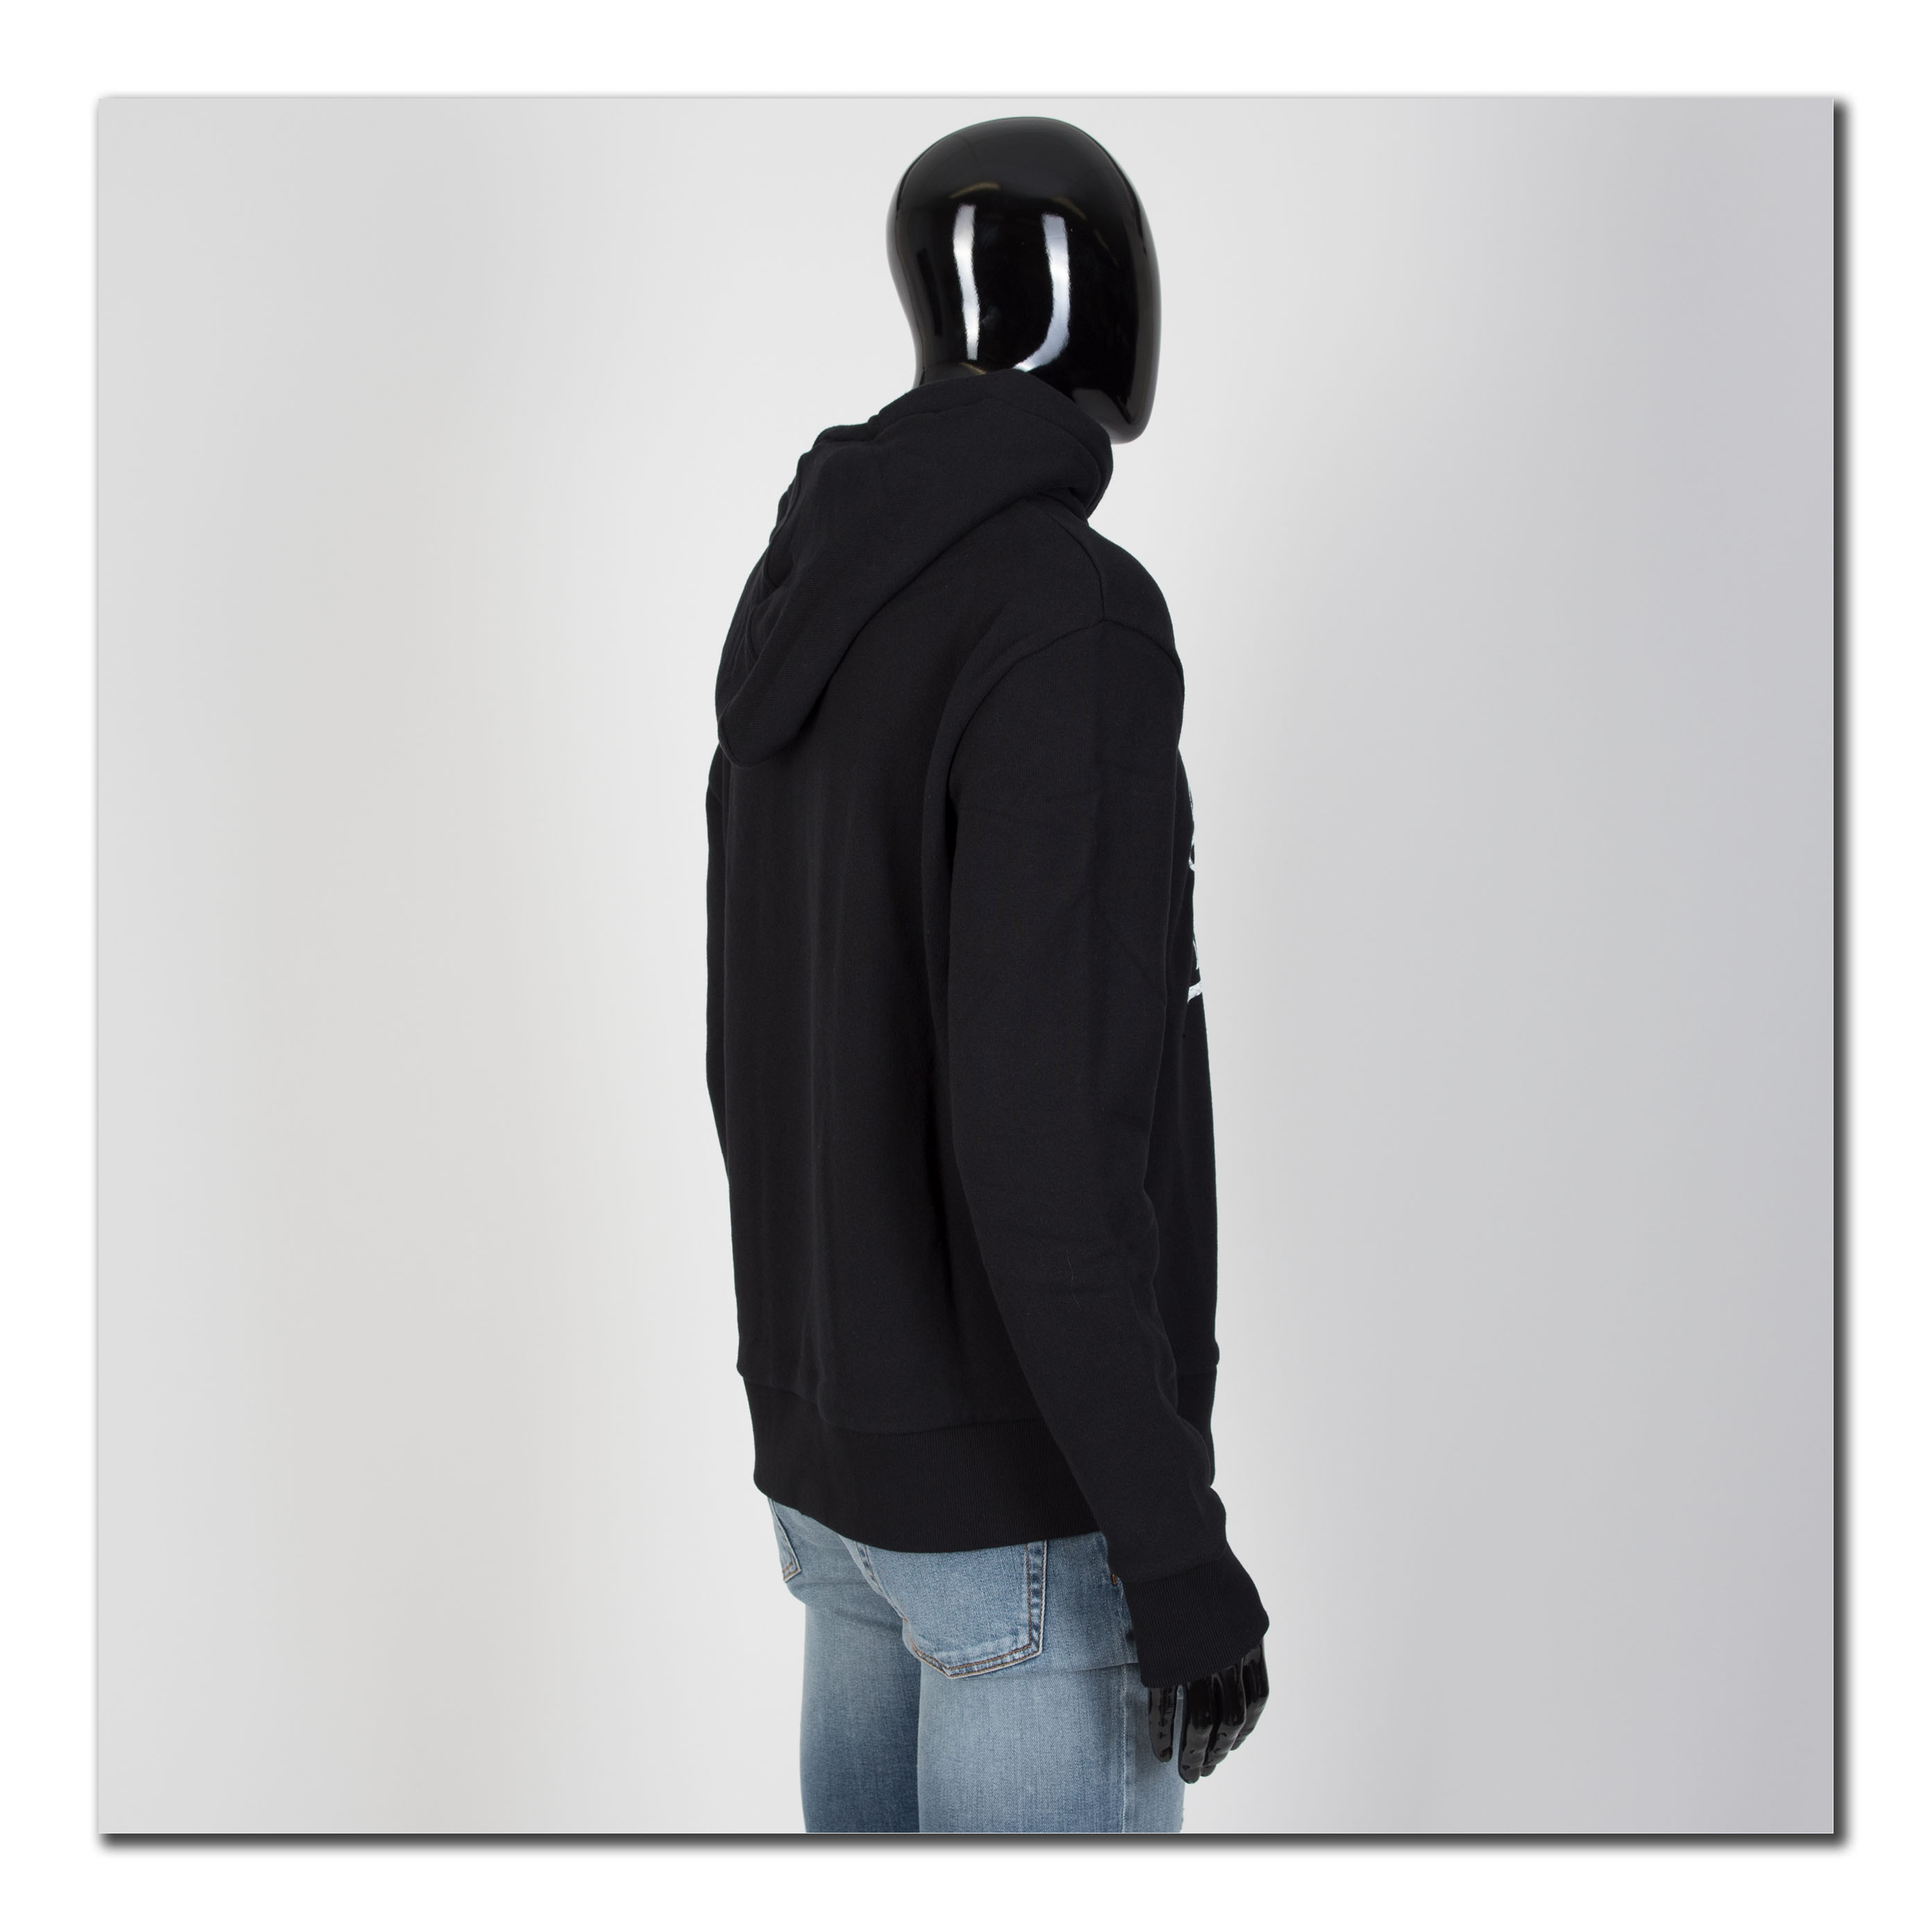 eea3cf15d2667 GUCCI 1280  Oversize Sweatshirt With Vintage Gucci Logo In Black